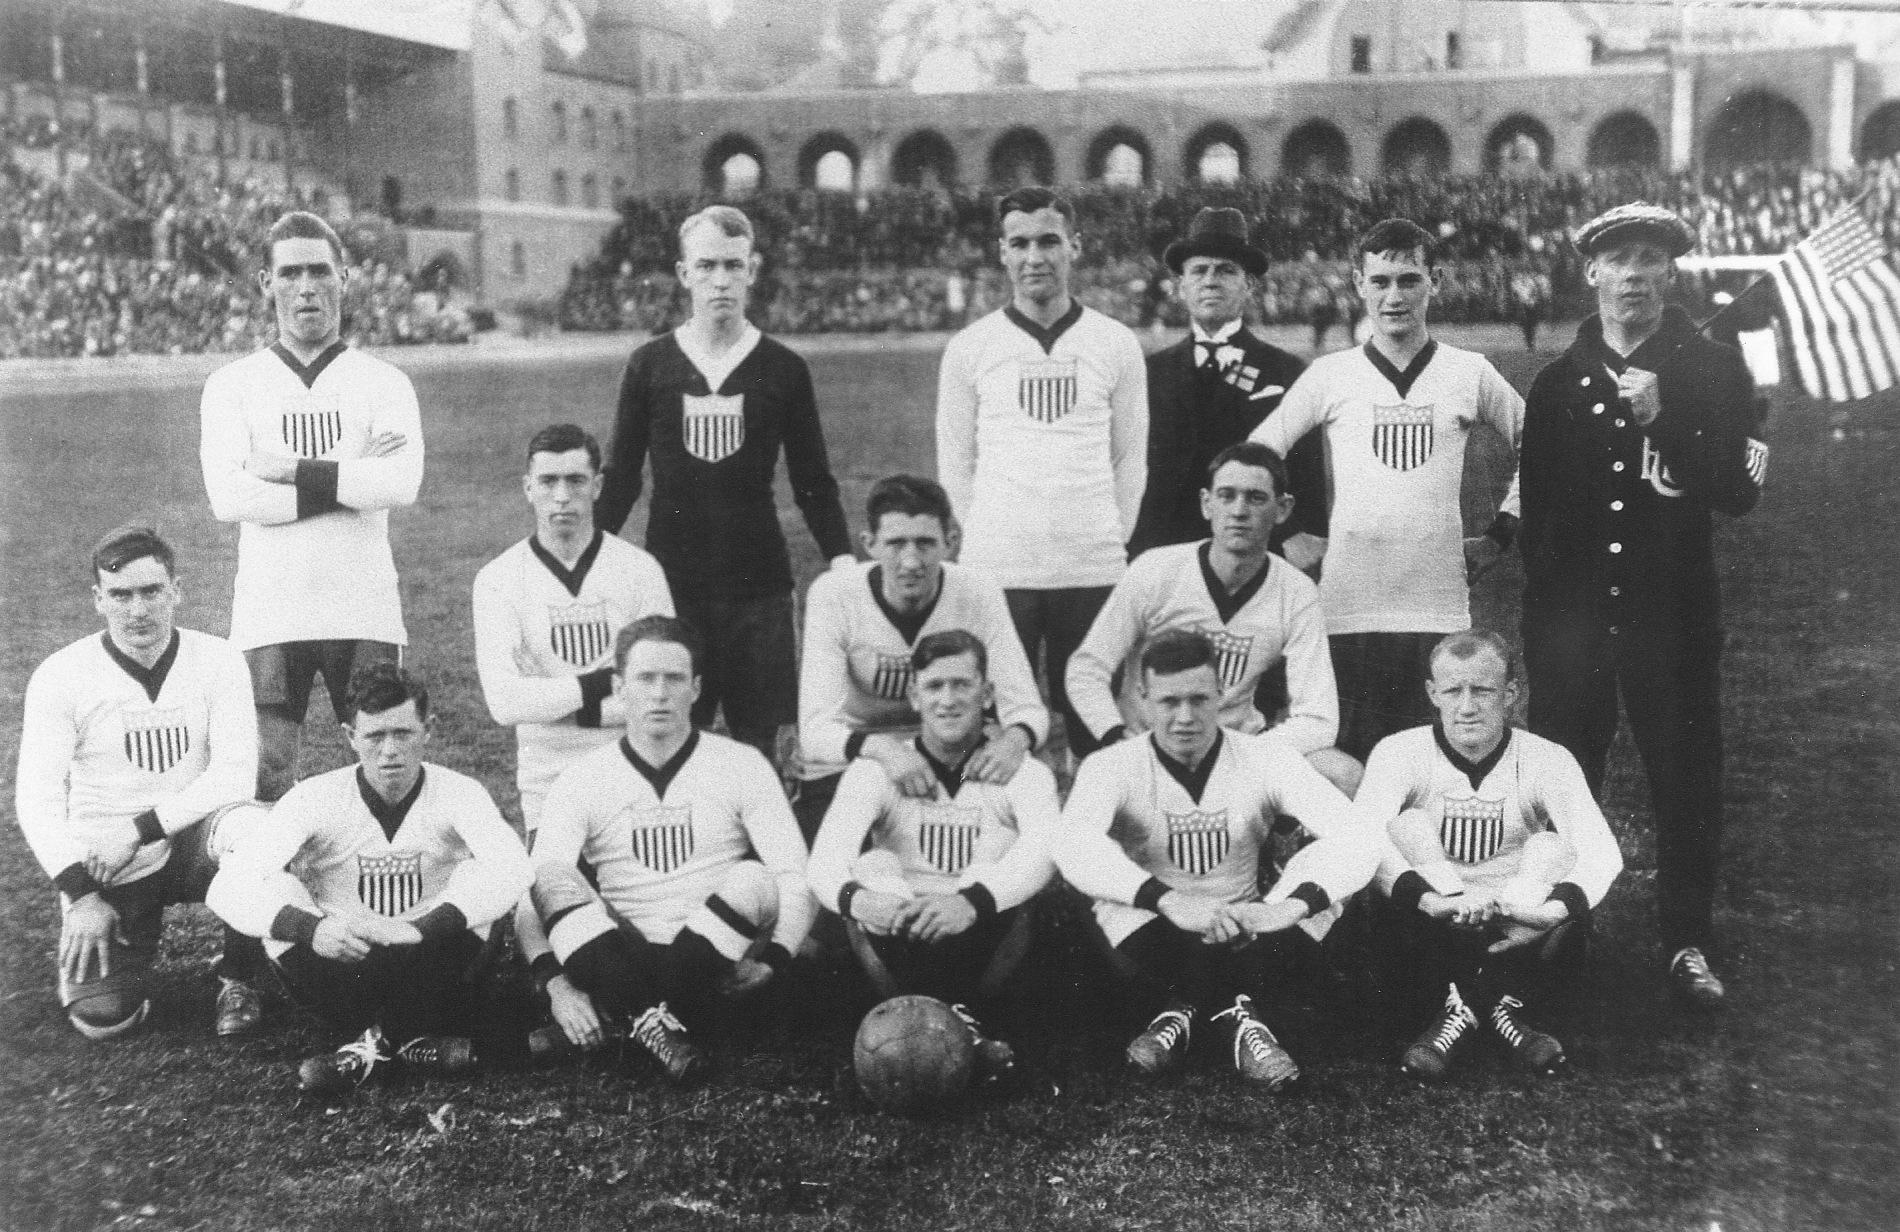 U.S. soccer team 1916